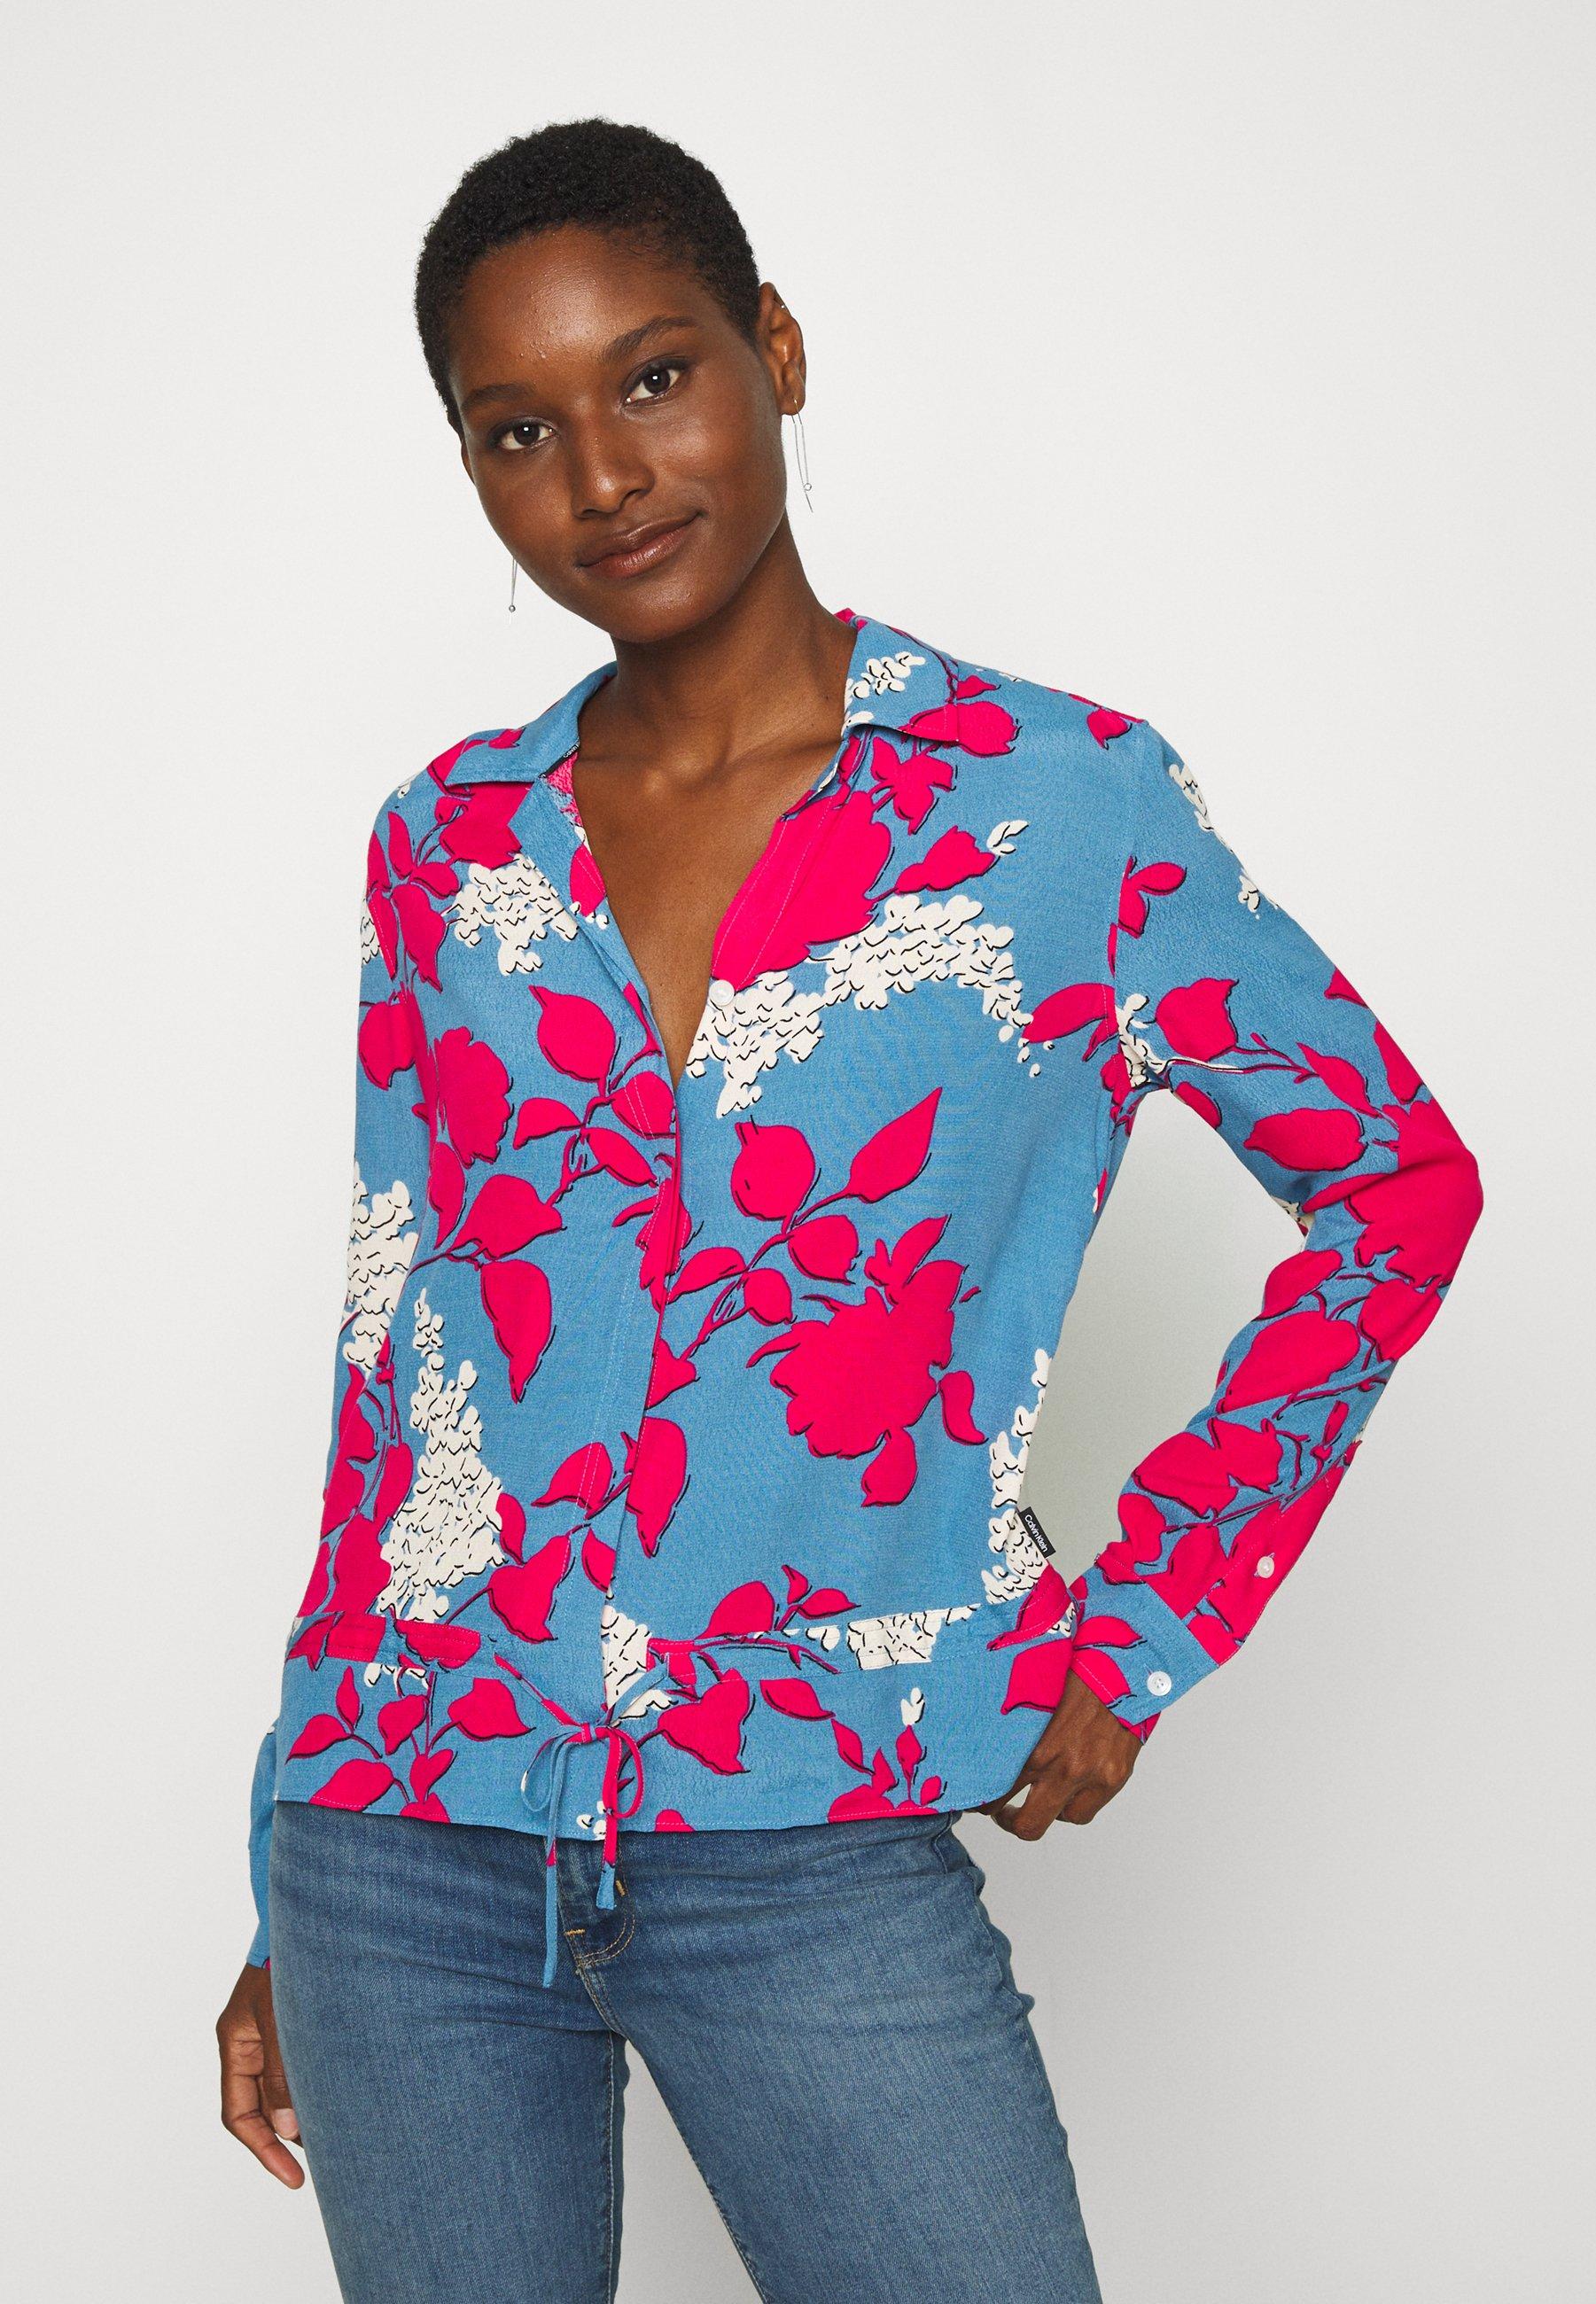 Official Women's Clothing Calvin Klein Button-down blouse light blue/pink QE0KCYFQB